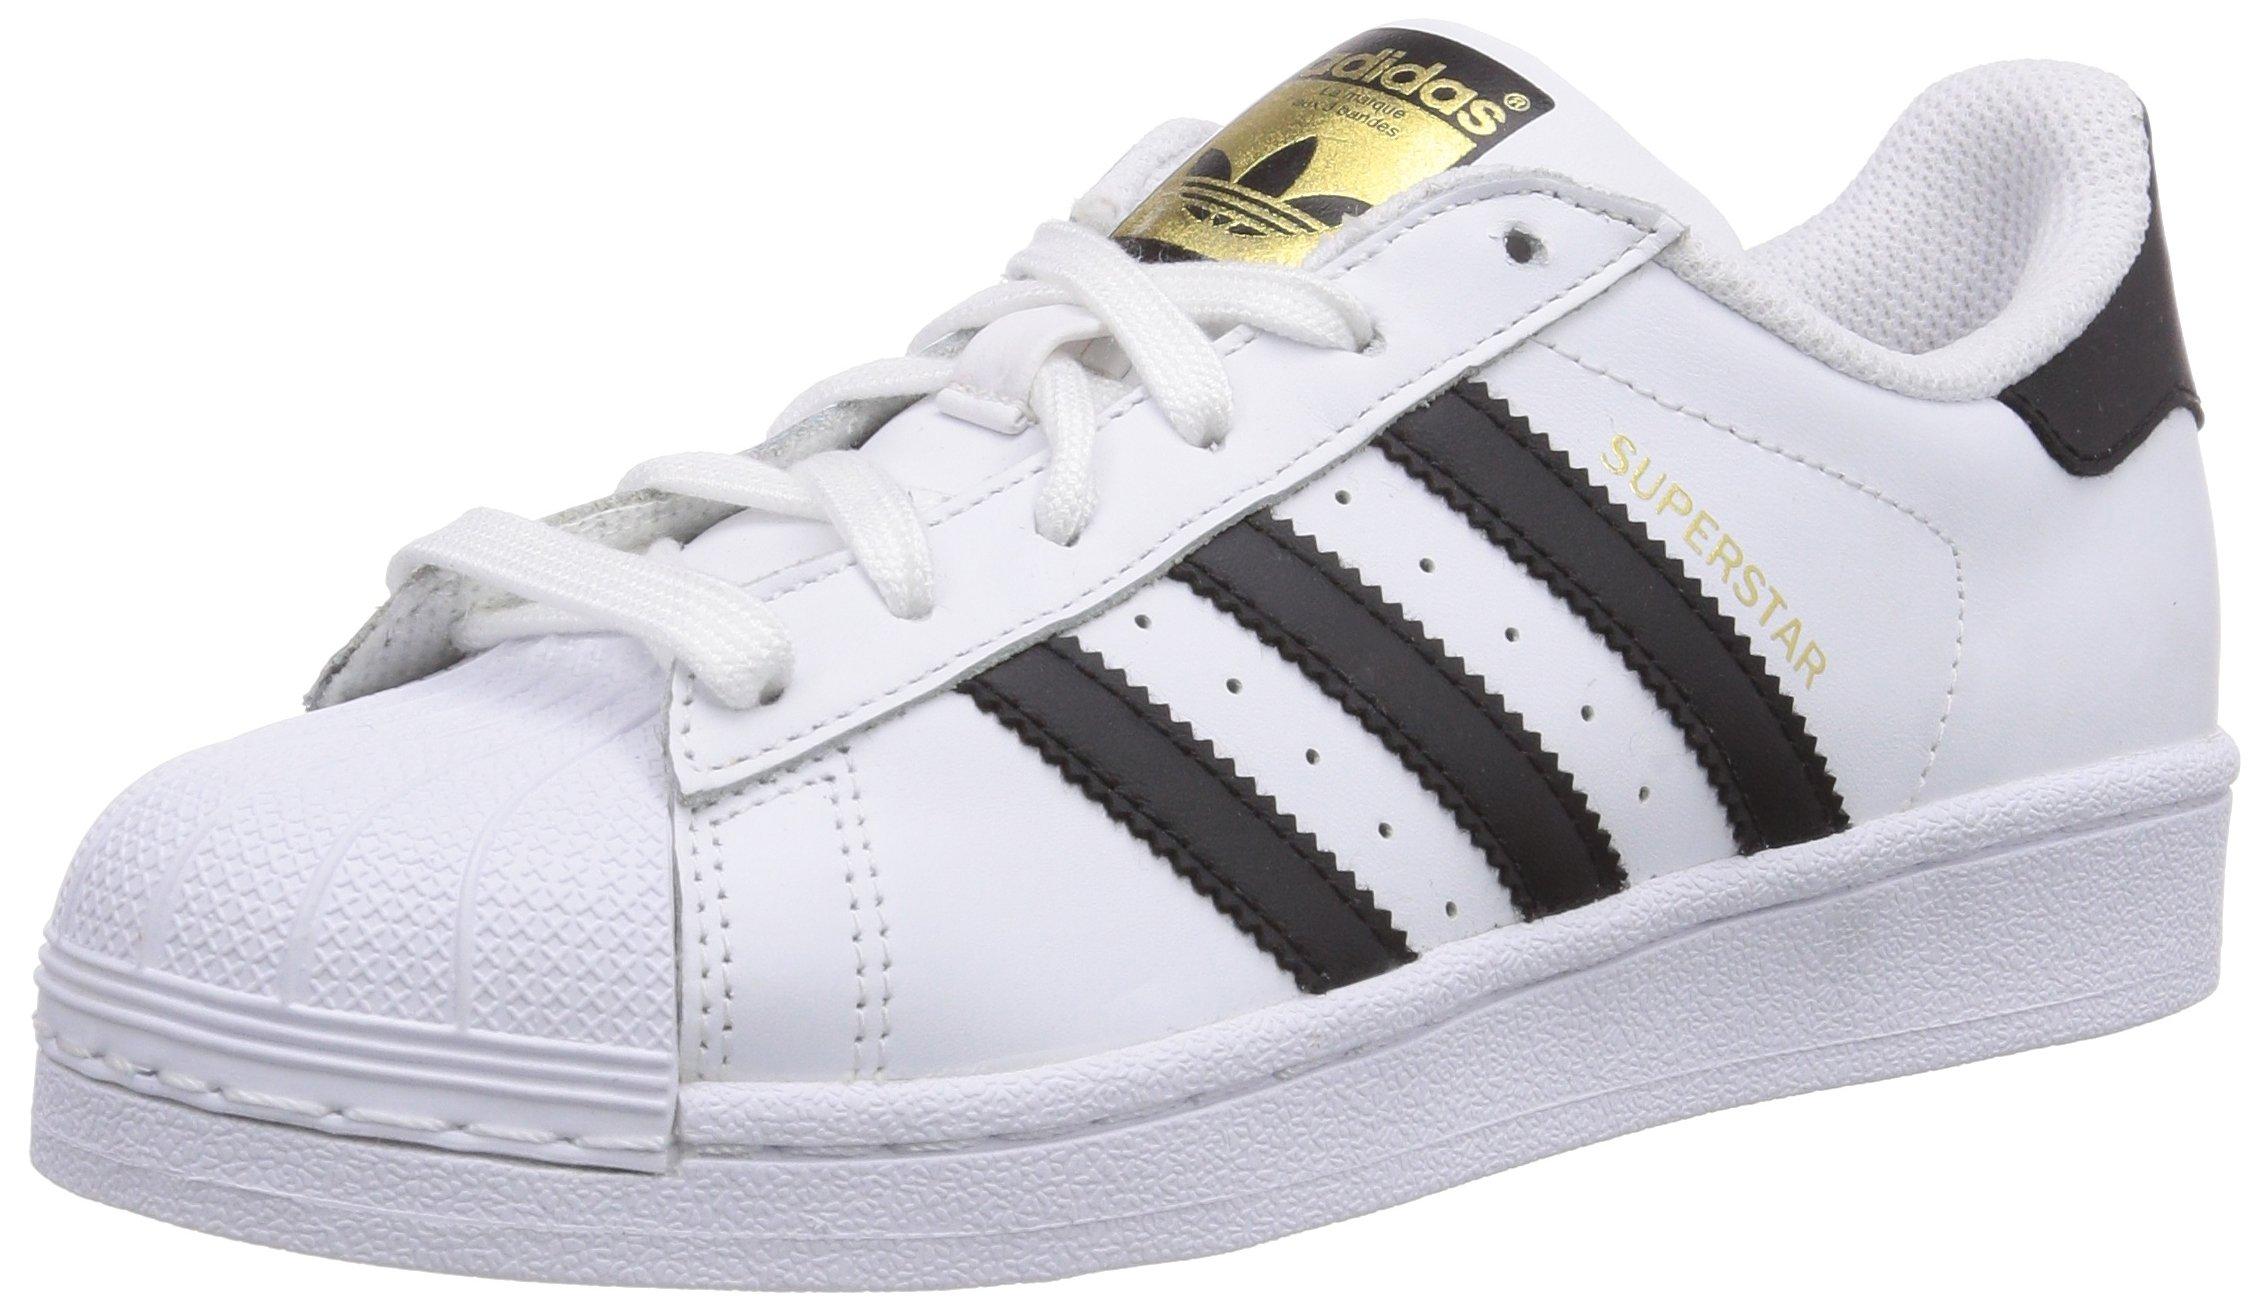 adidas Originals Men's Superstar Basketball Sneaker,White/Core Black/White,4 M US